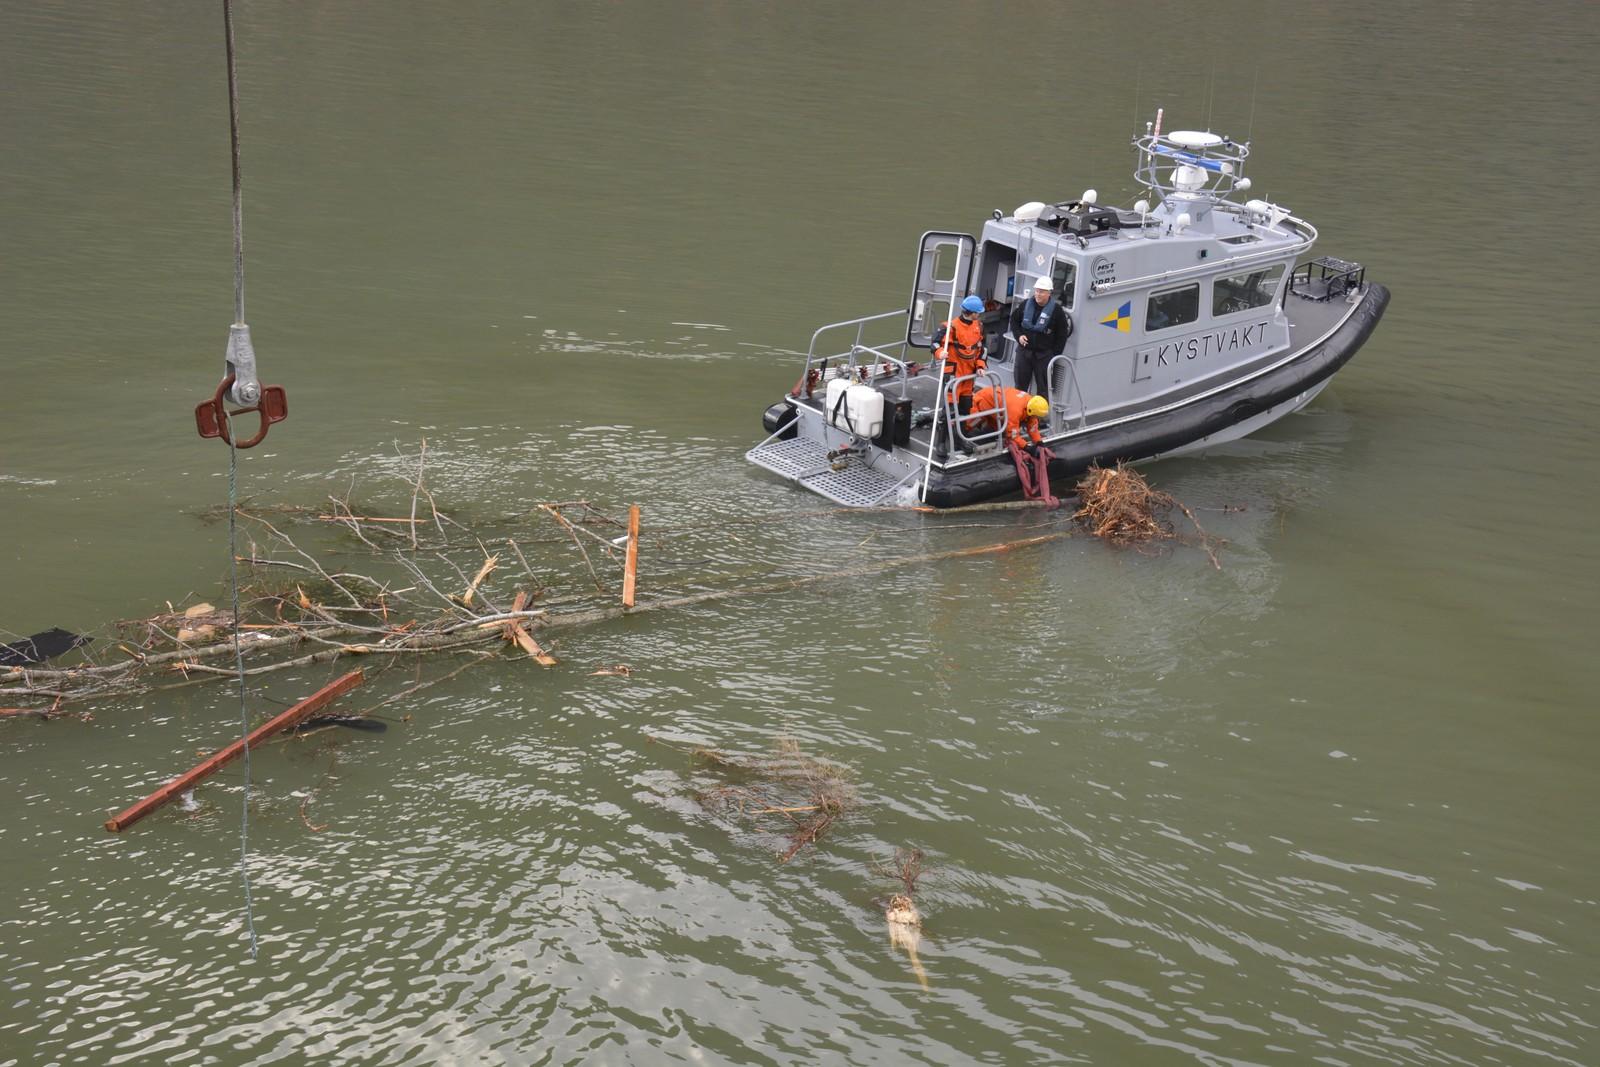 REKVE: KV Njords patruljebåt i sving under oppryddingsarbeidet.